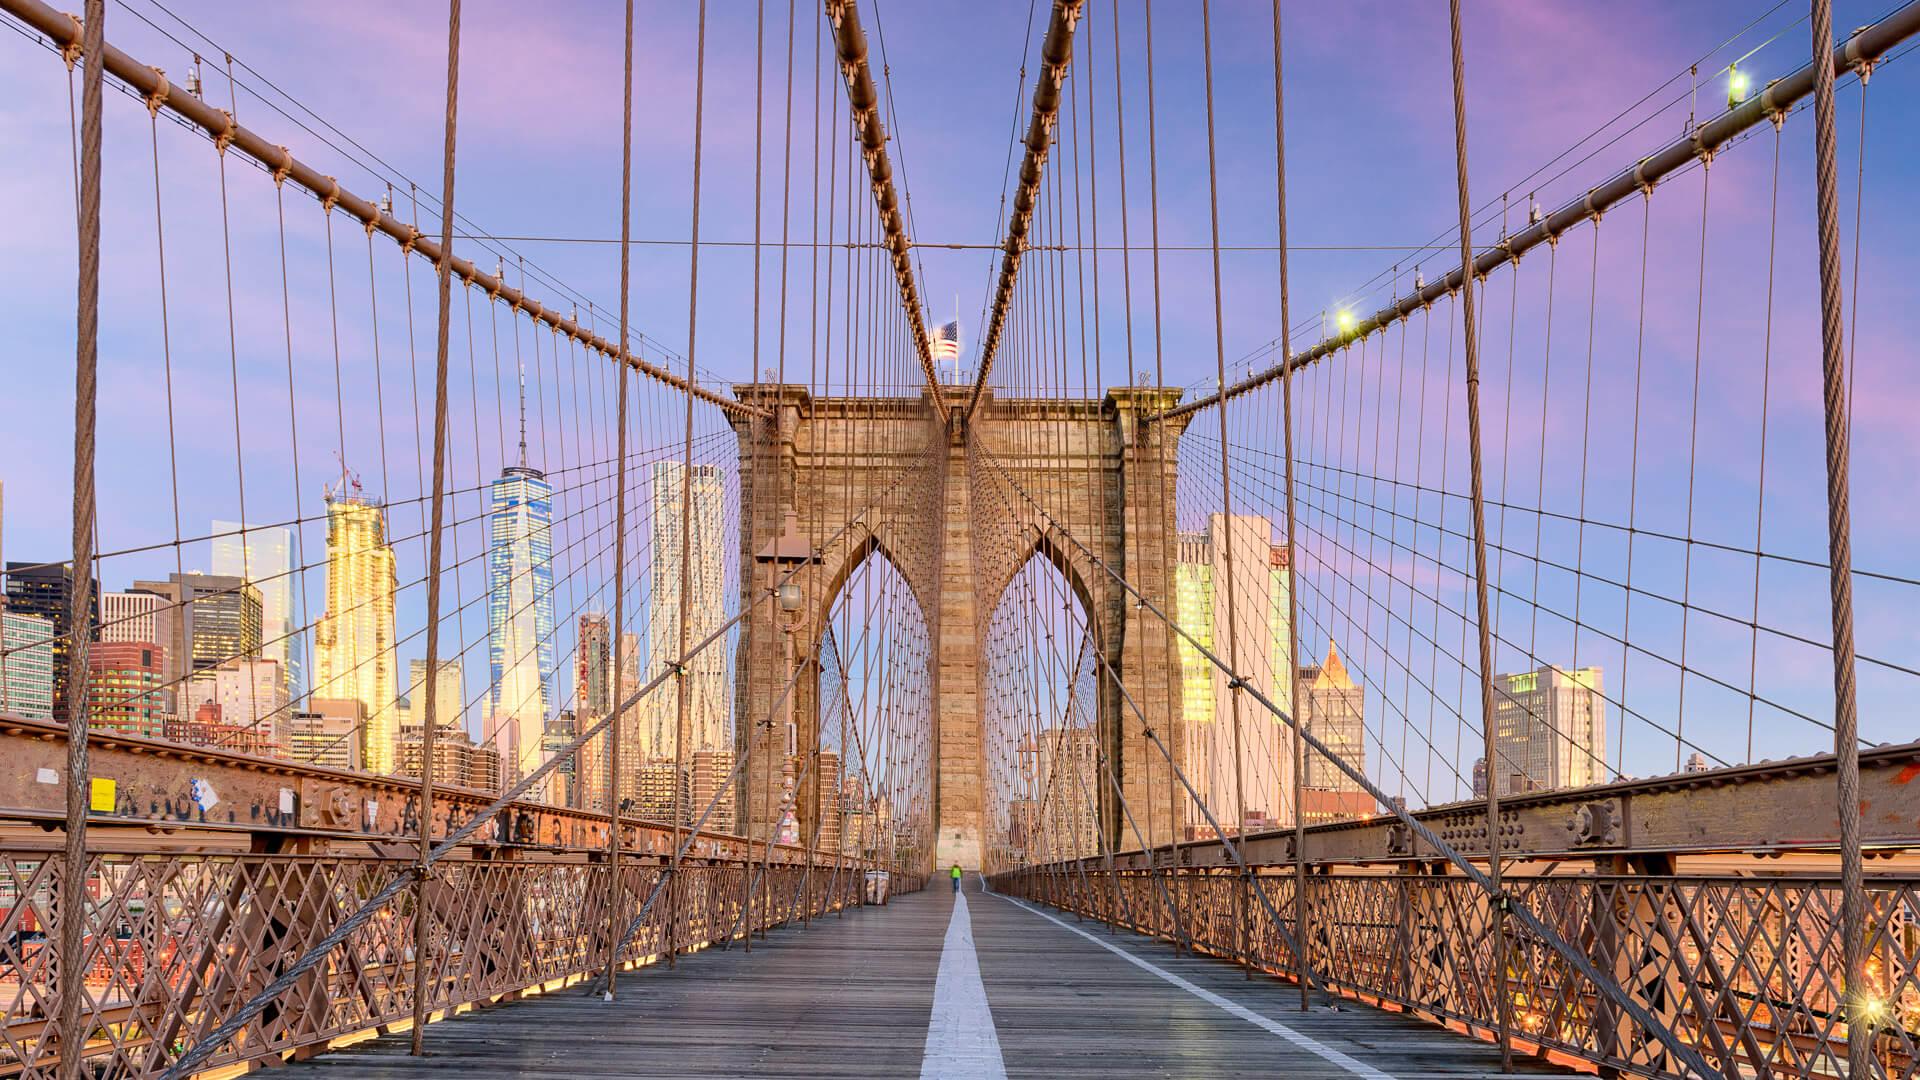 Brooklyn Bridge New York City